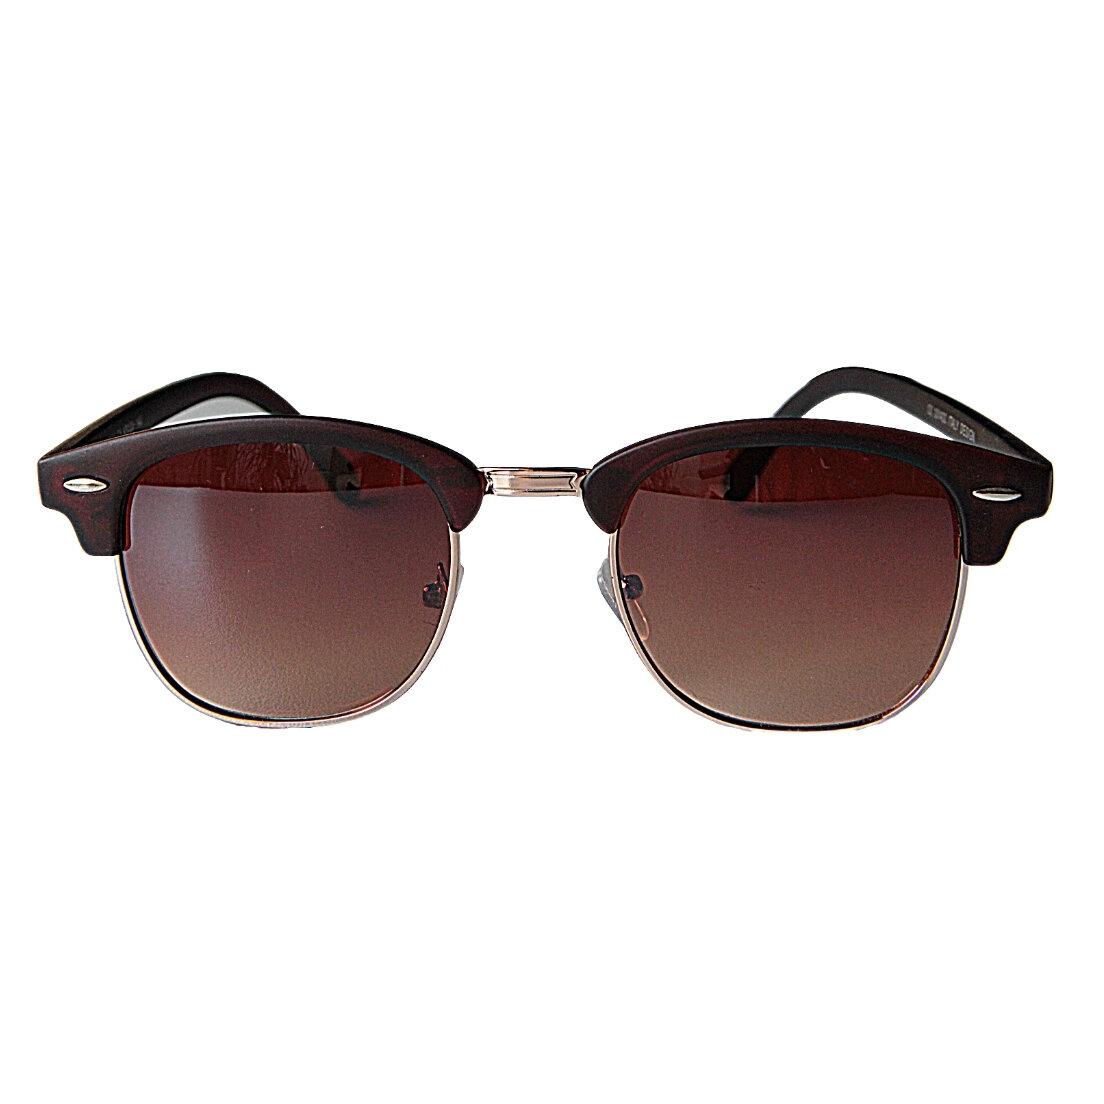 OUTLET - Óculos de Sol Khatto Clubmaster Classic